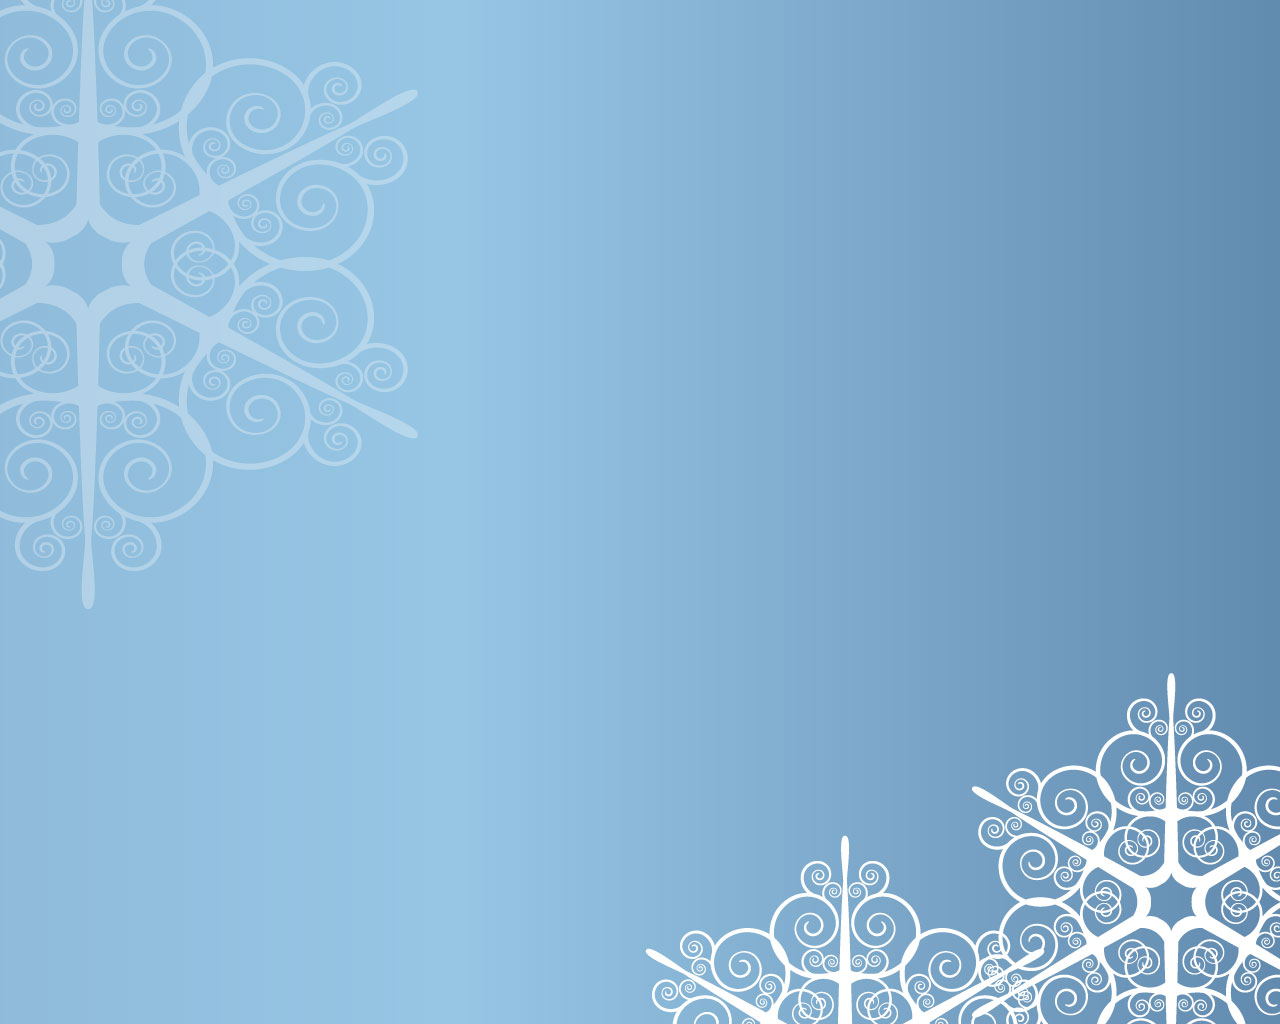 Merry Christmas Clipart .-Merry Christmas Clipart .-9